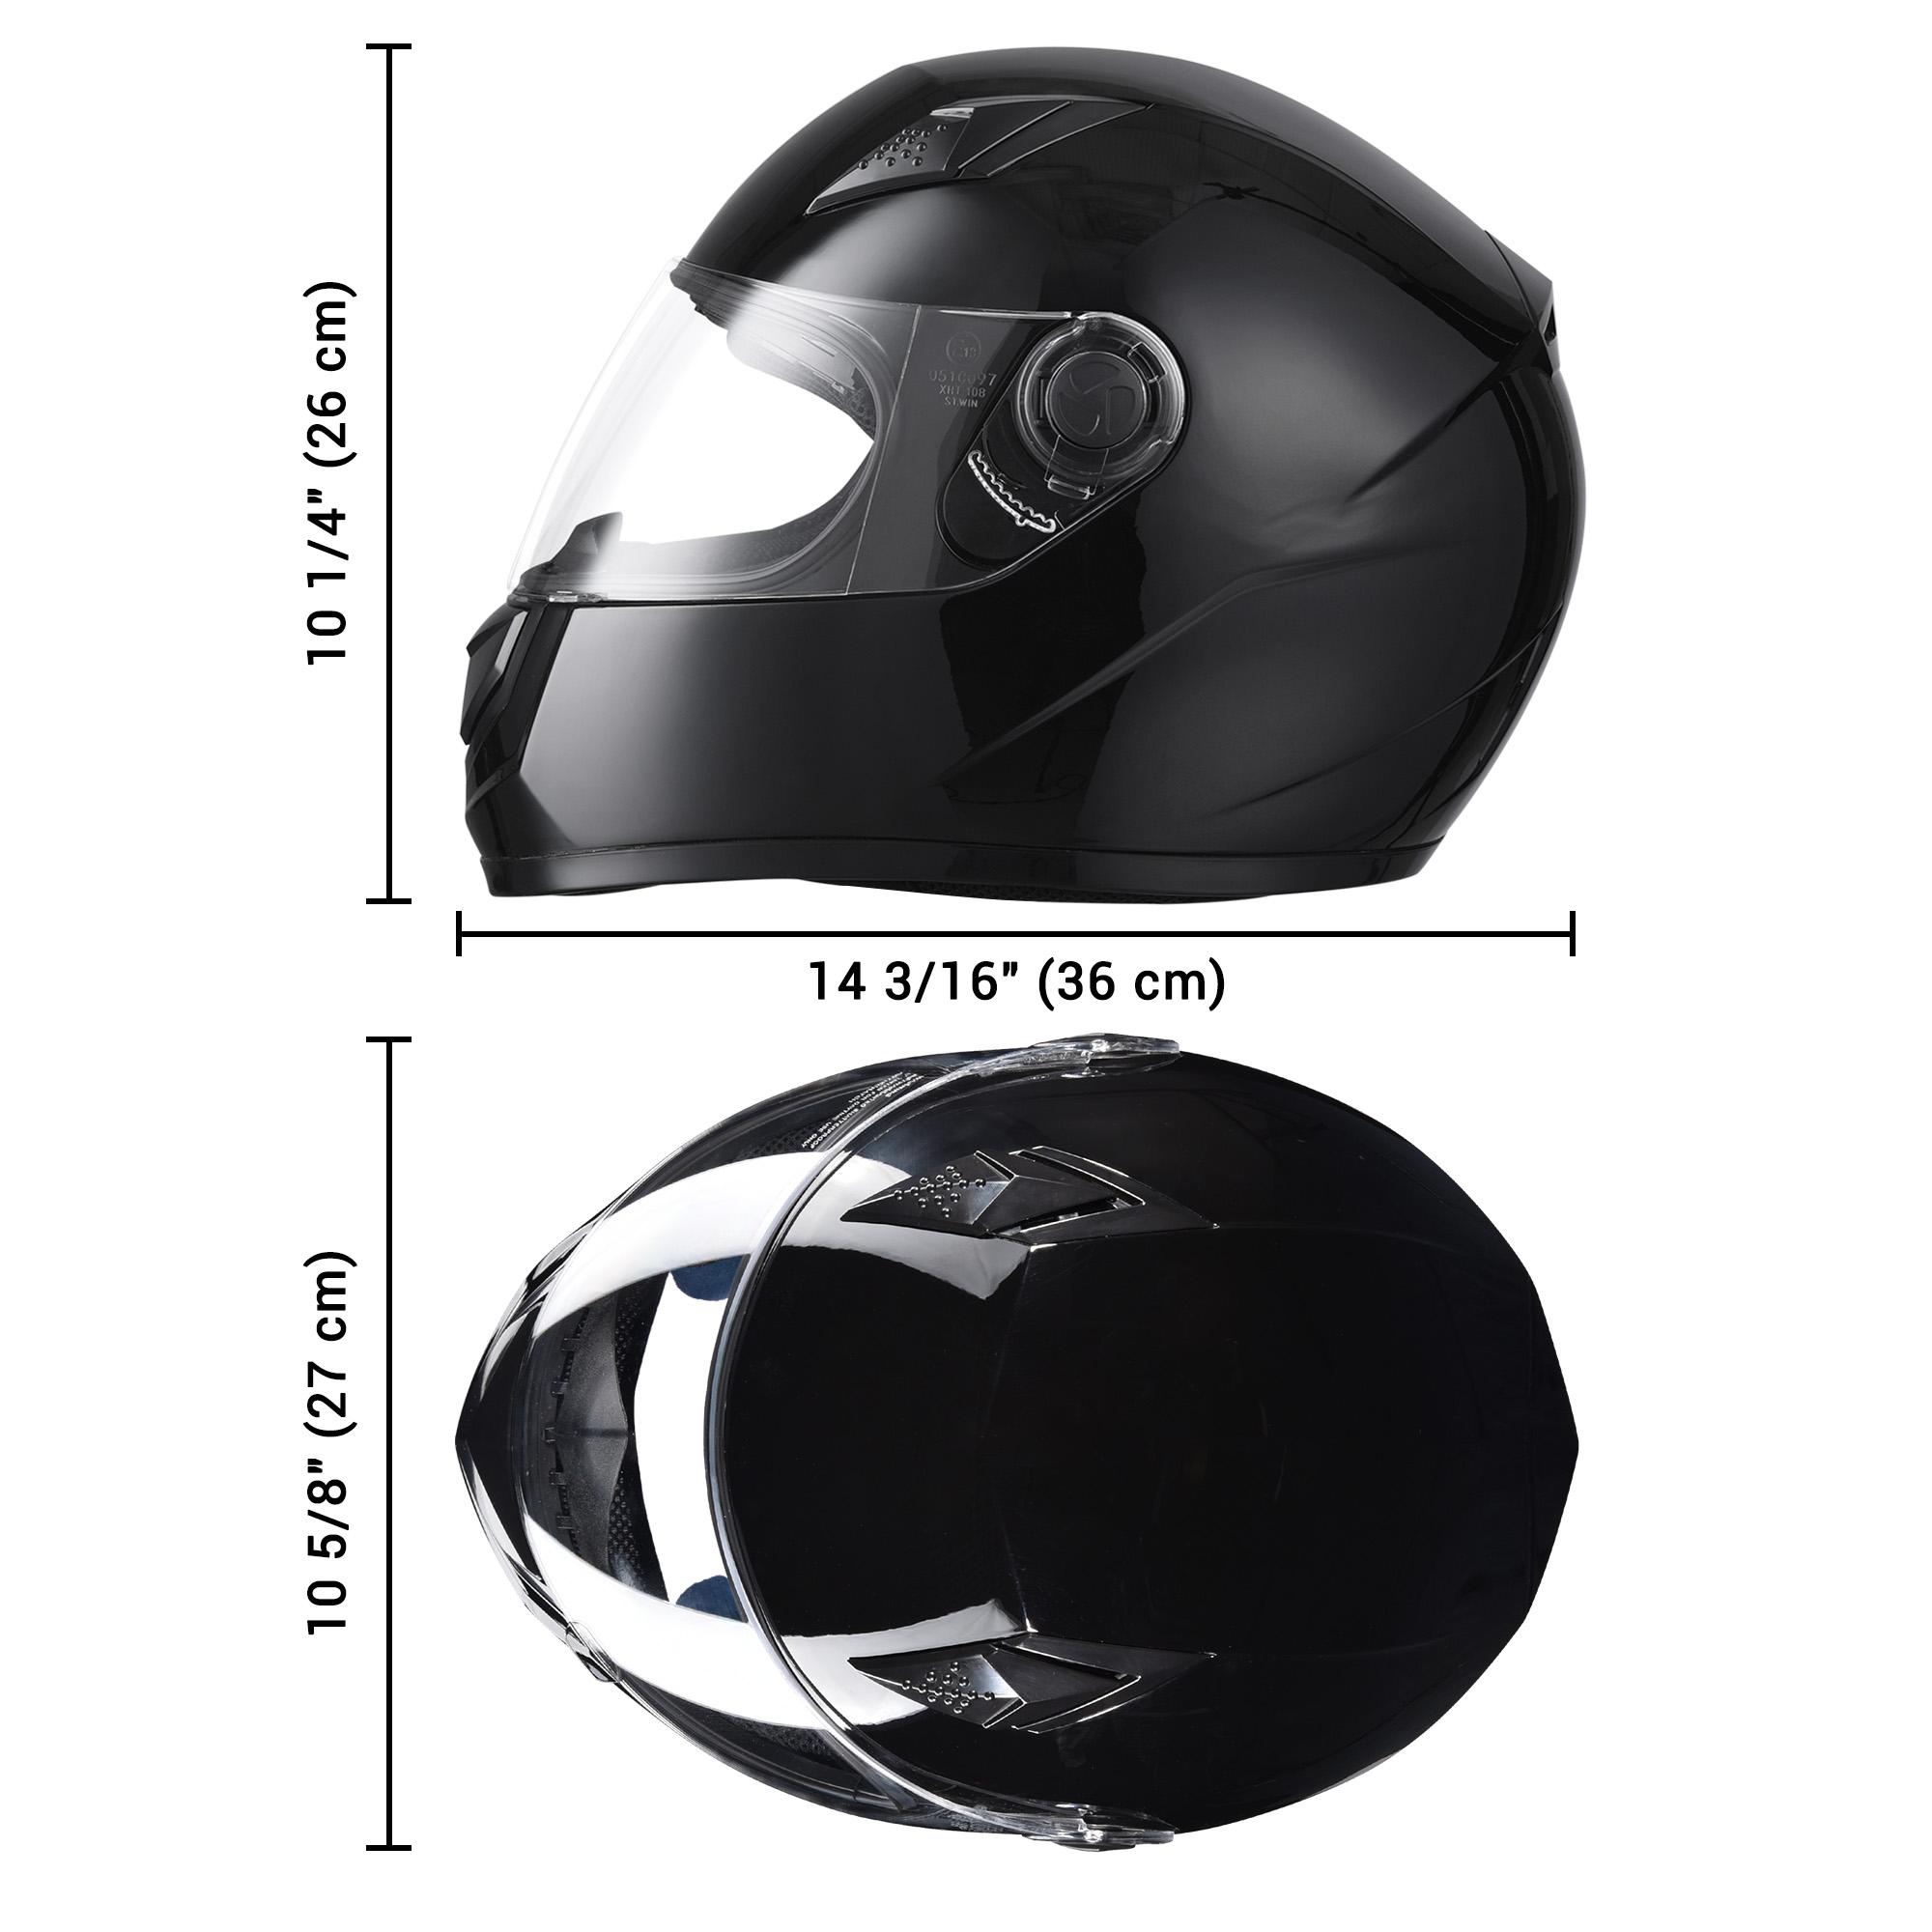 miniature 23 - AHR K12 Full Face Motorcycle Helmet DOT Air Vents Clear Visor Racing S M L XL